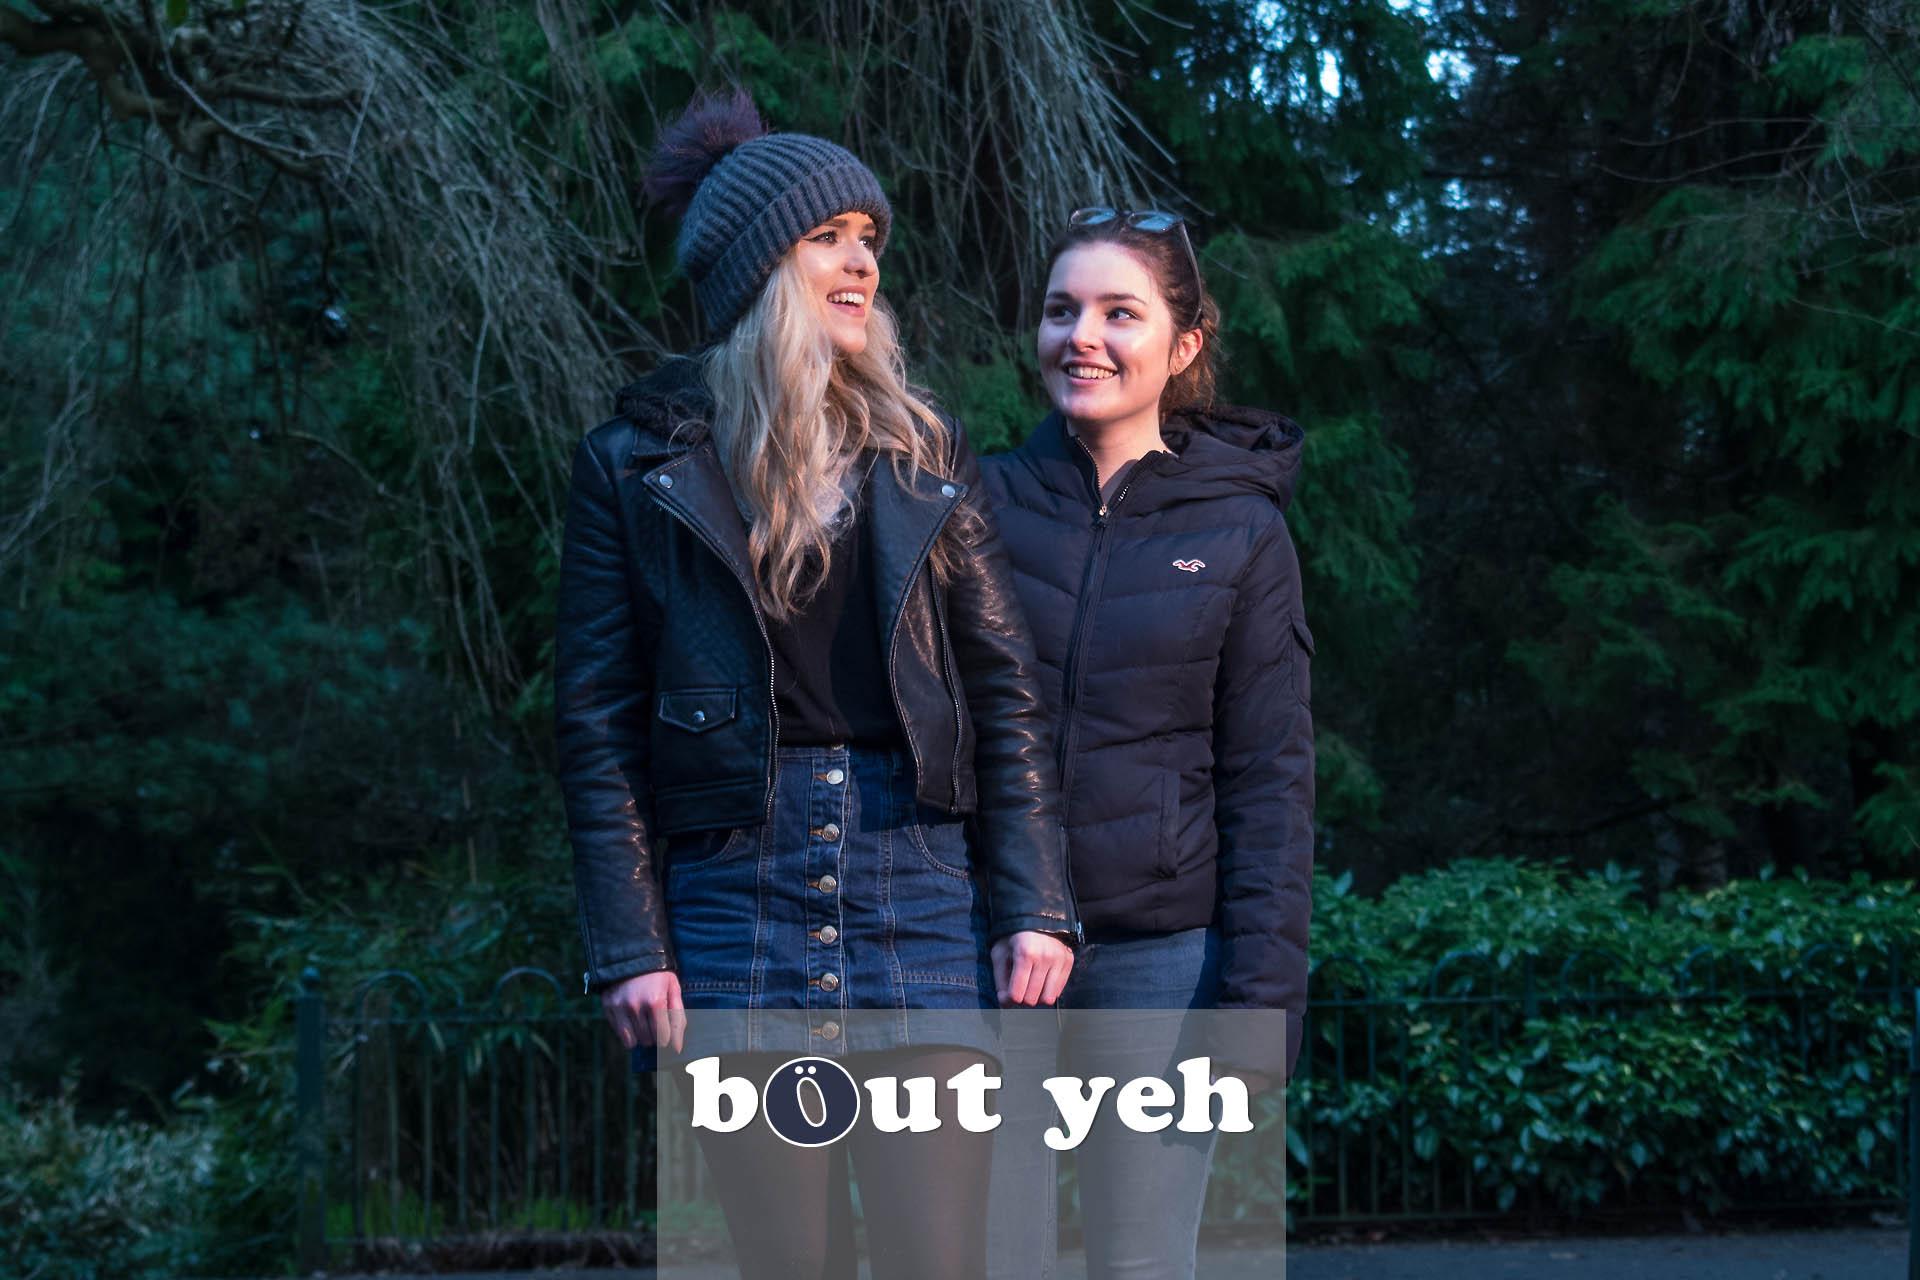 Student friends in Botanic Gardens, Belfast - photo 4345.